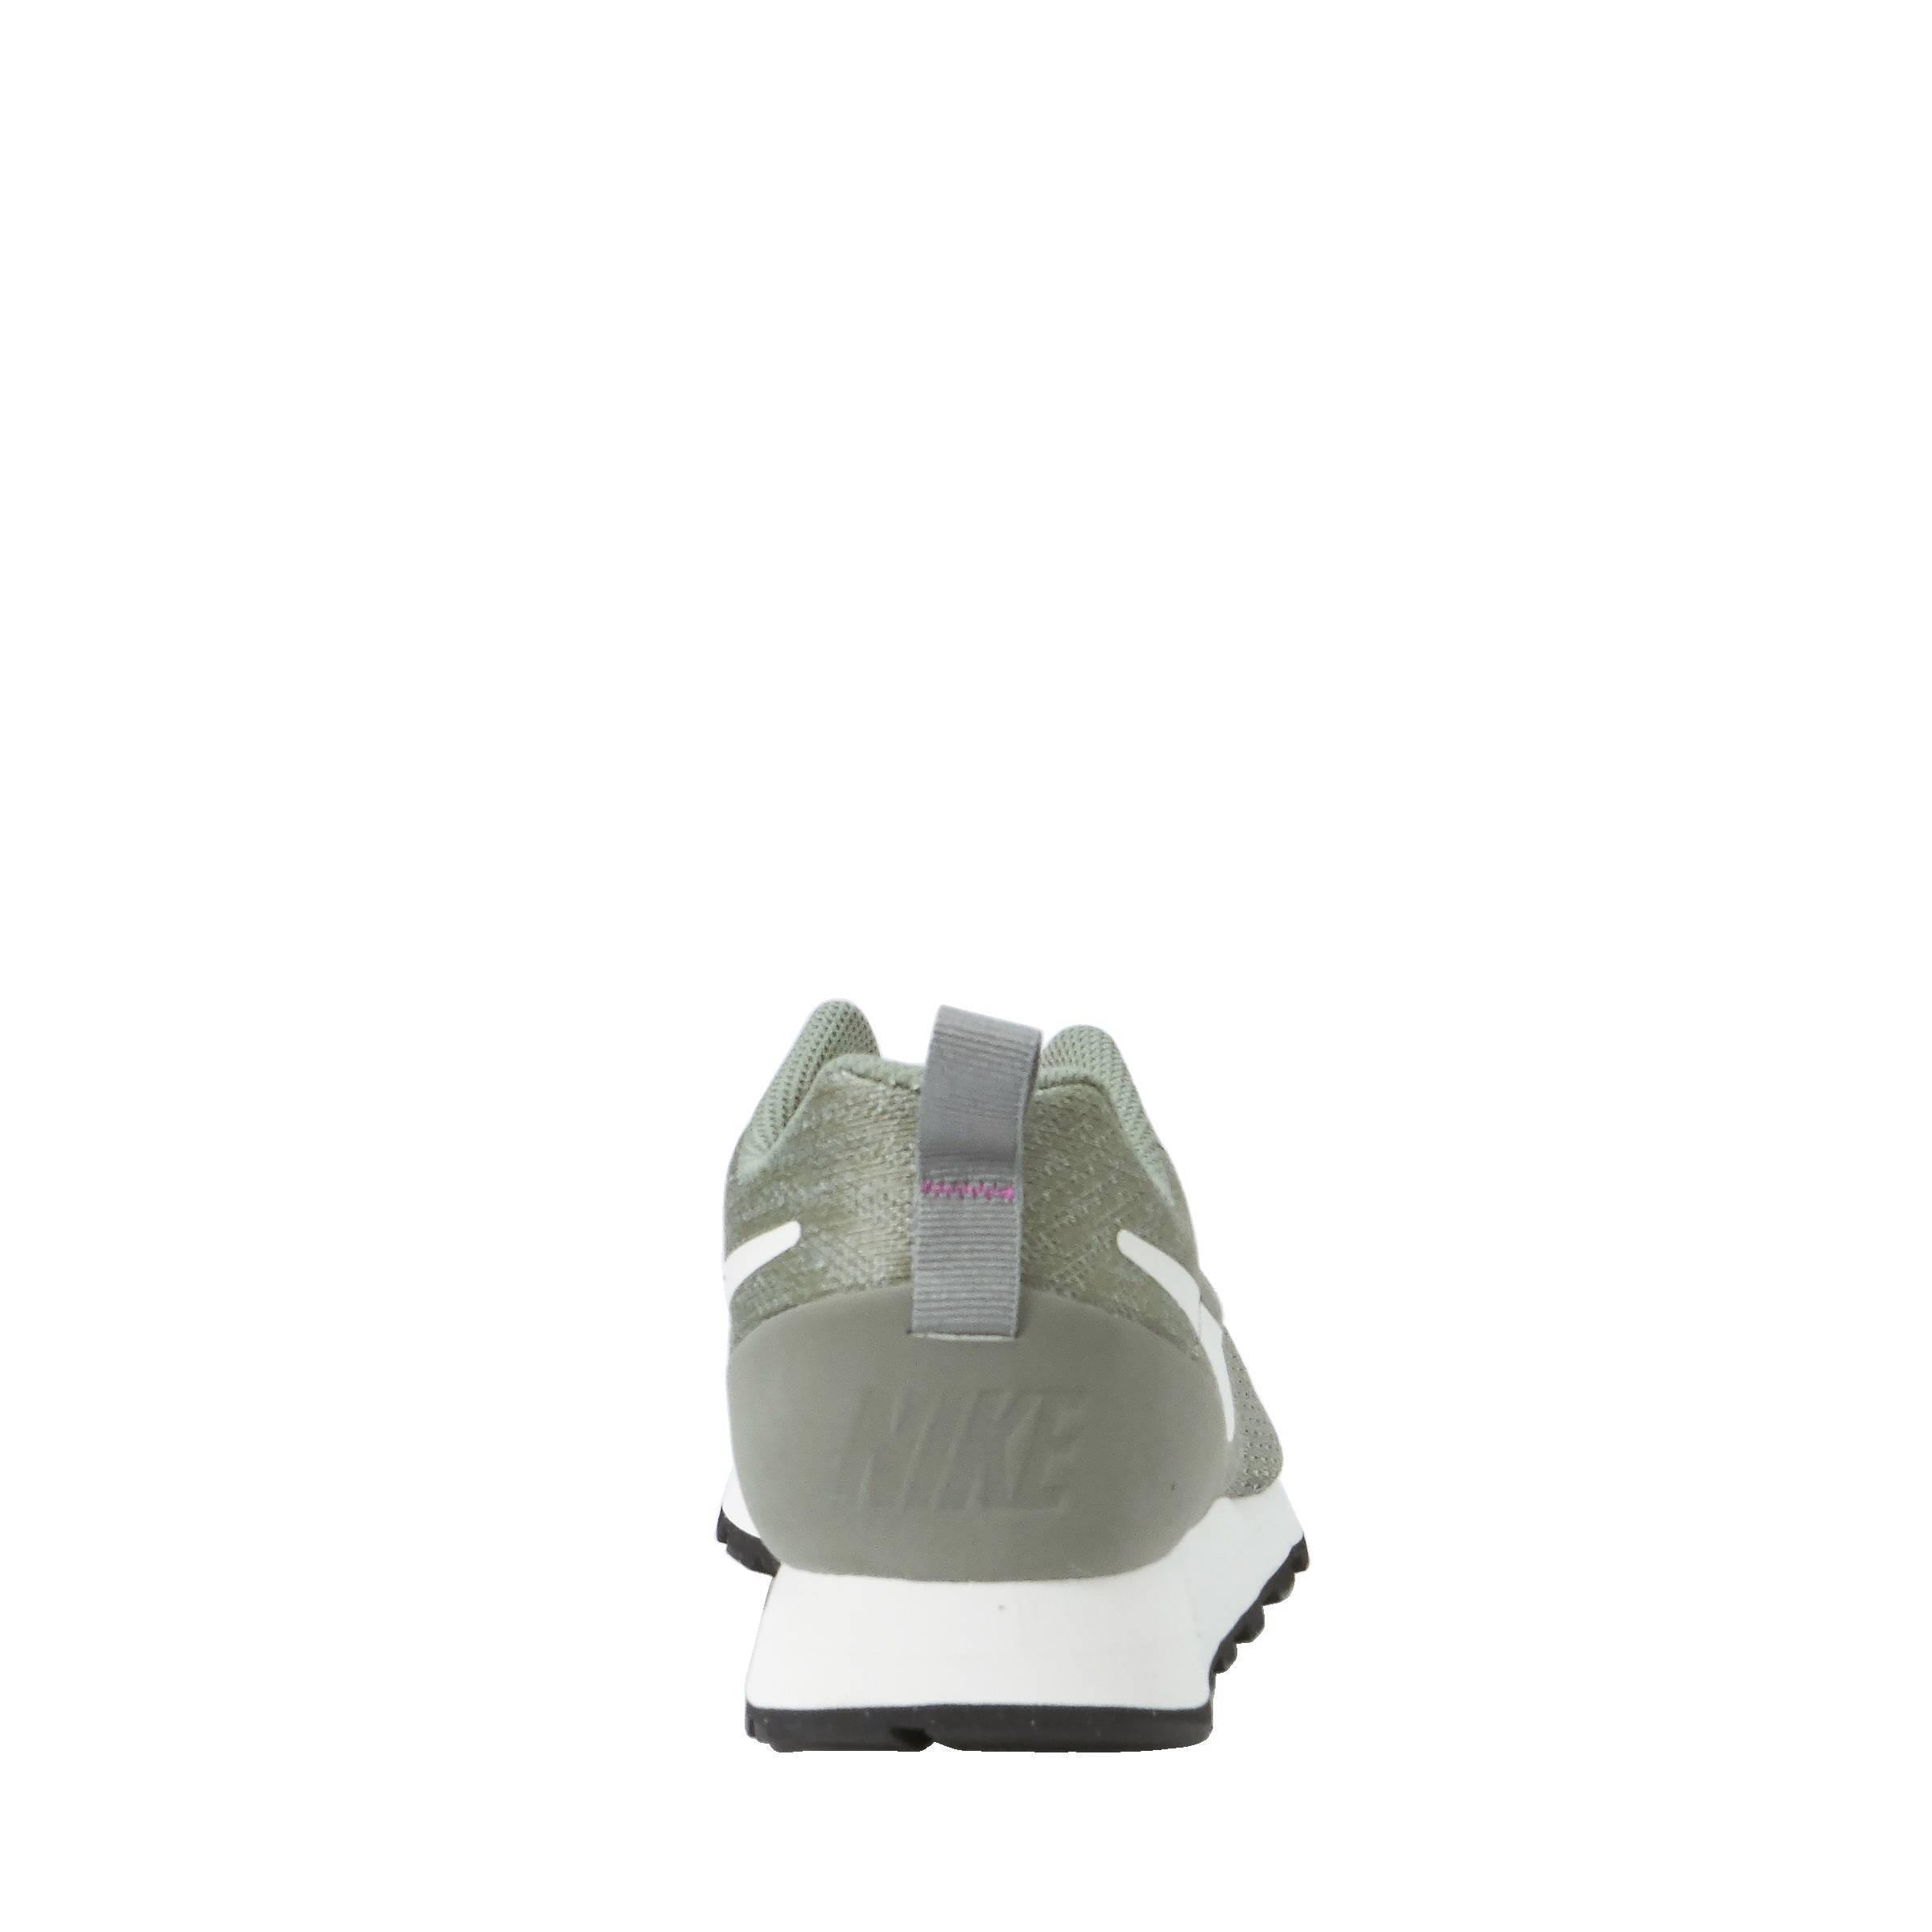 d3c18e3b881 Nike MD Runner 2 Eng Mesh sneakers   wehkamp